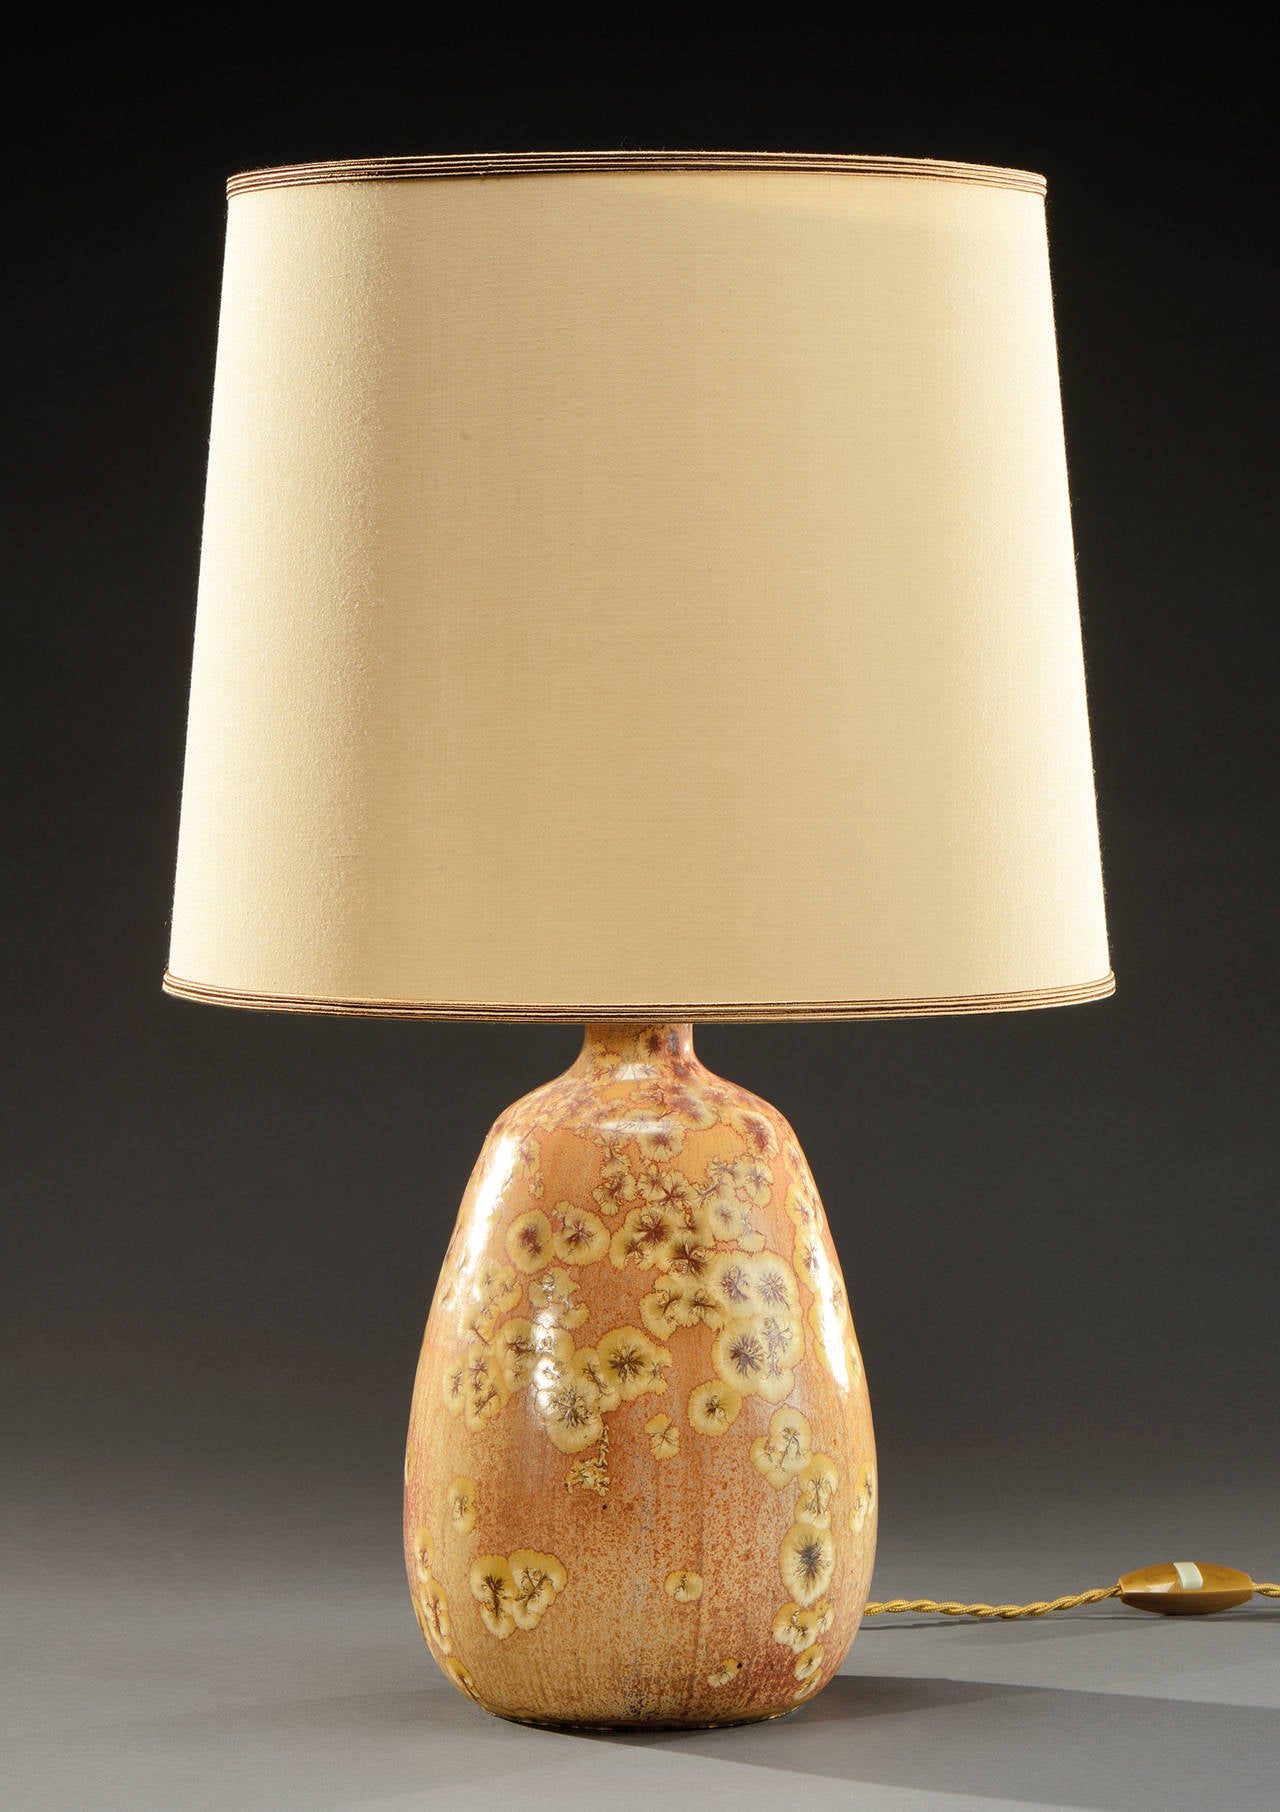 Elegant Ceramic Lamp by Pierre-Adrien Dalpayrat at 1stdibs